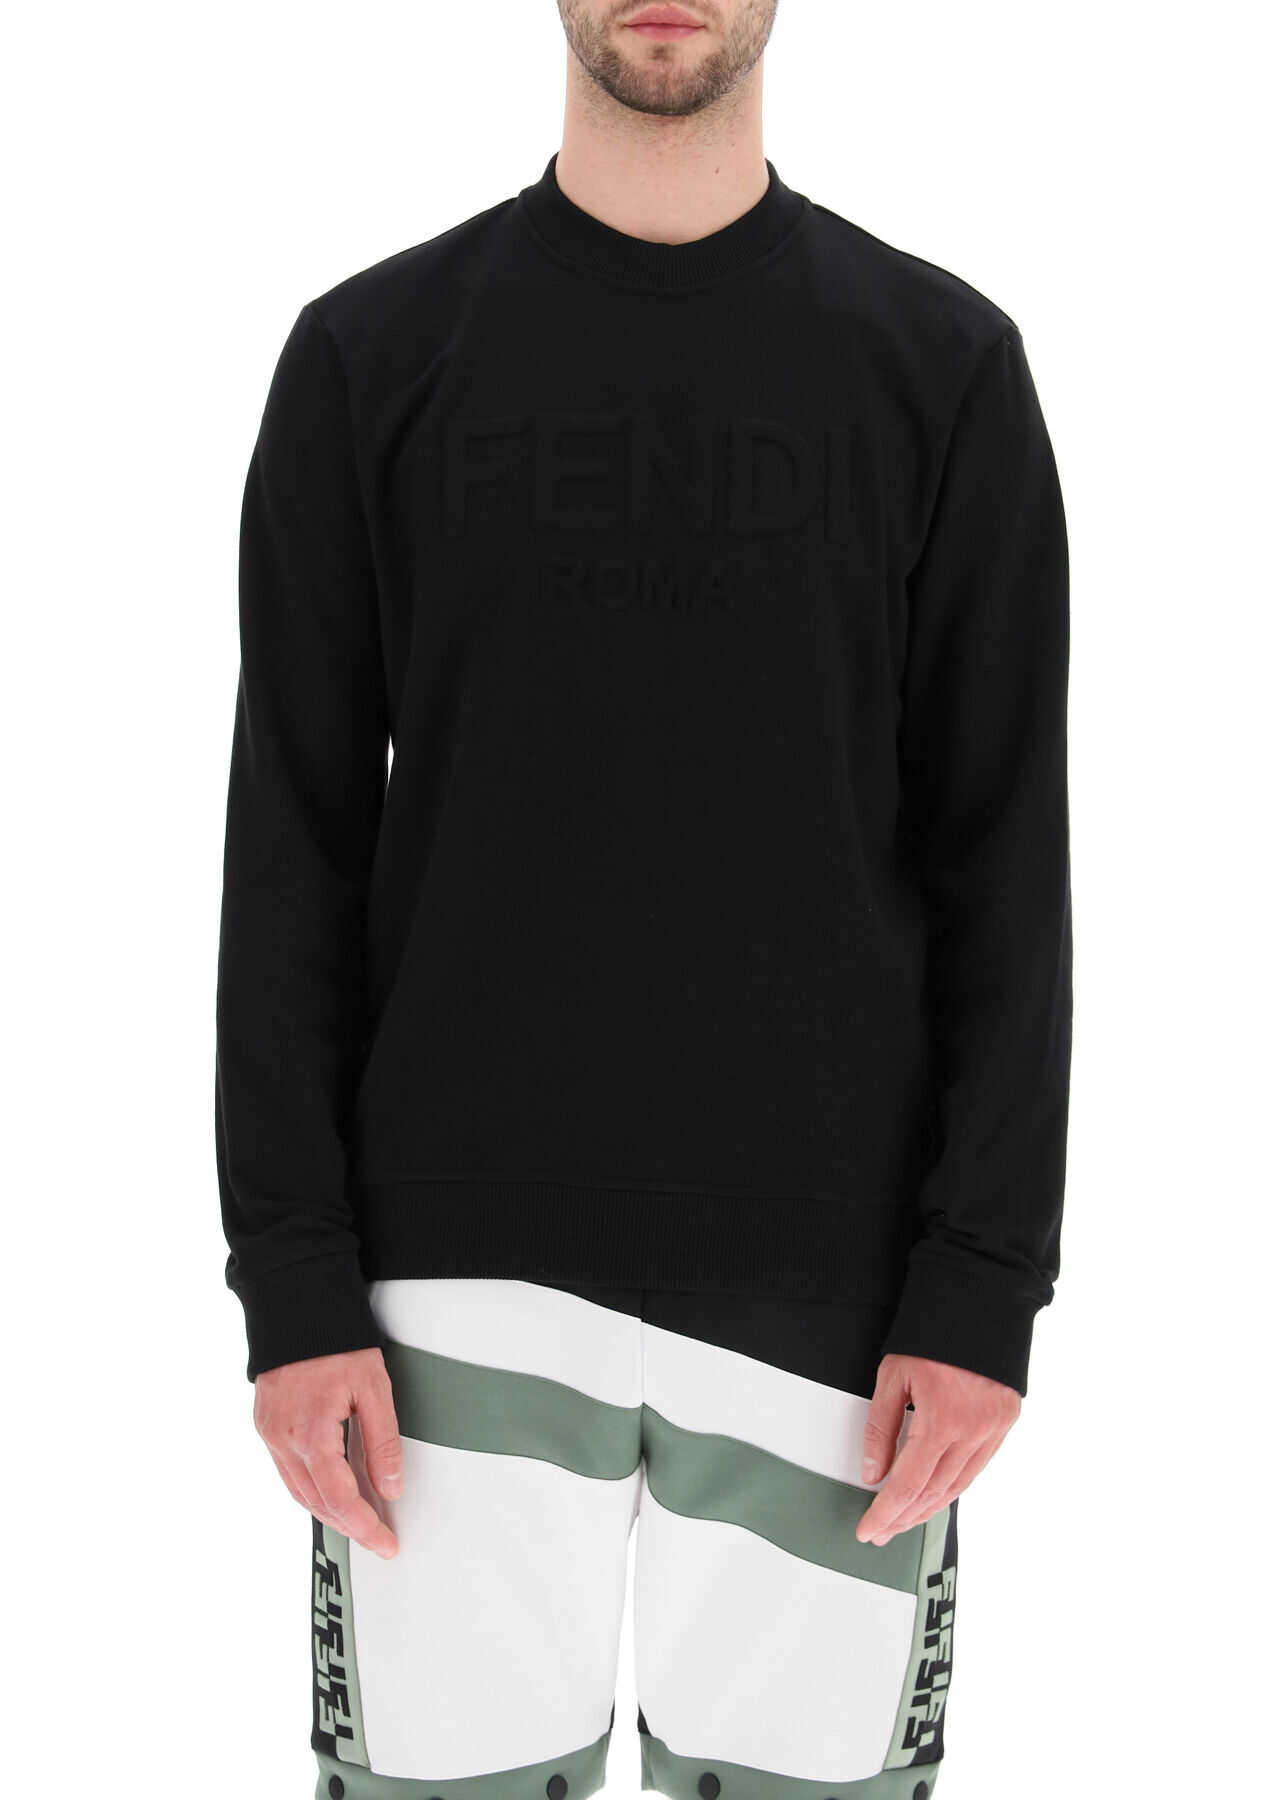 Fendi Crew Neck Sweatshirt With Trompe L'oeil Logo NERO imagine